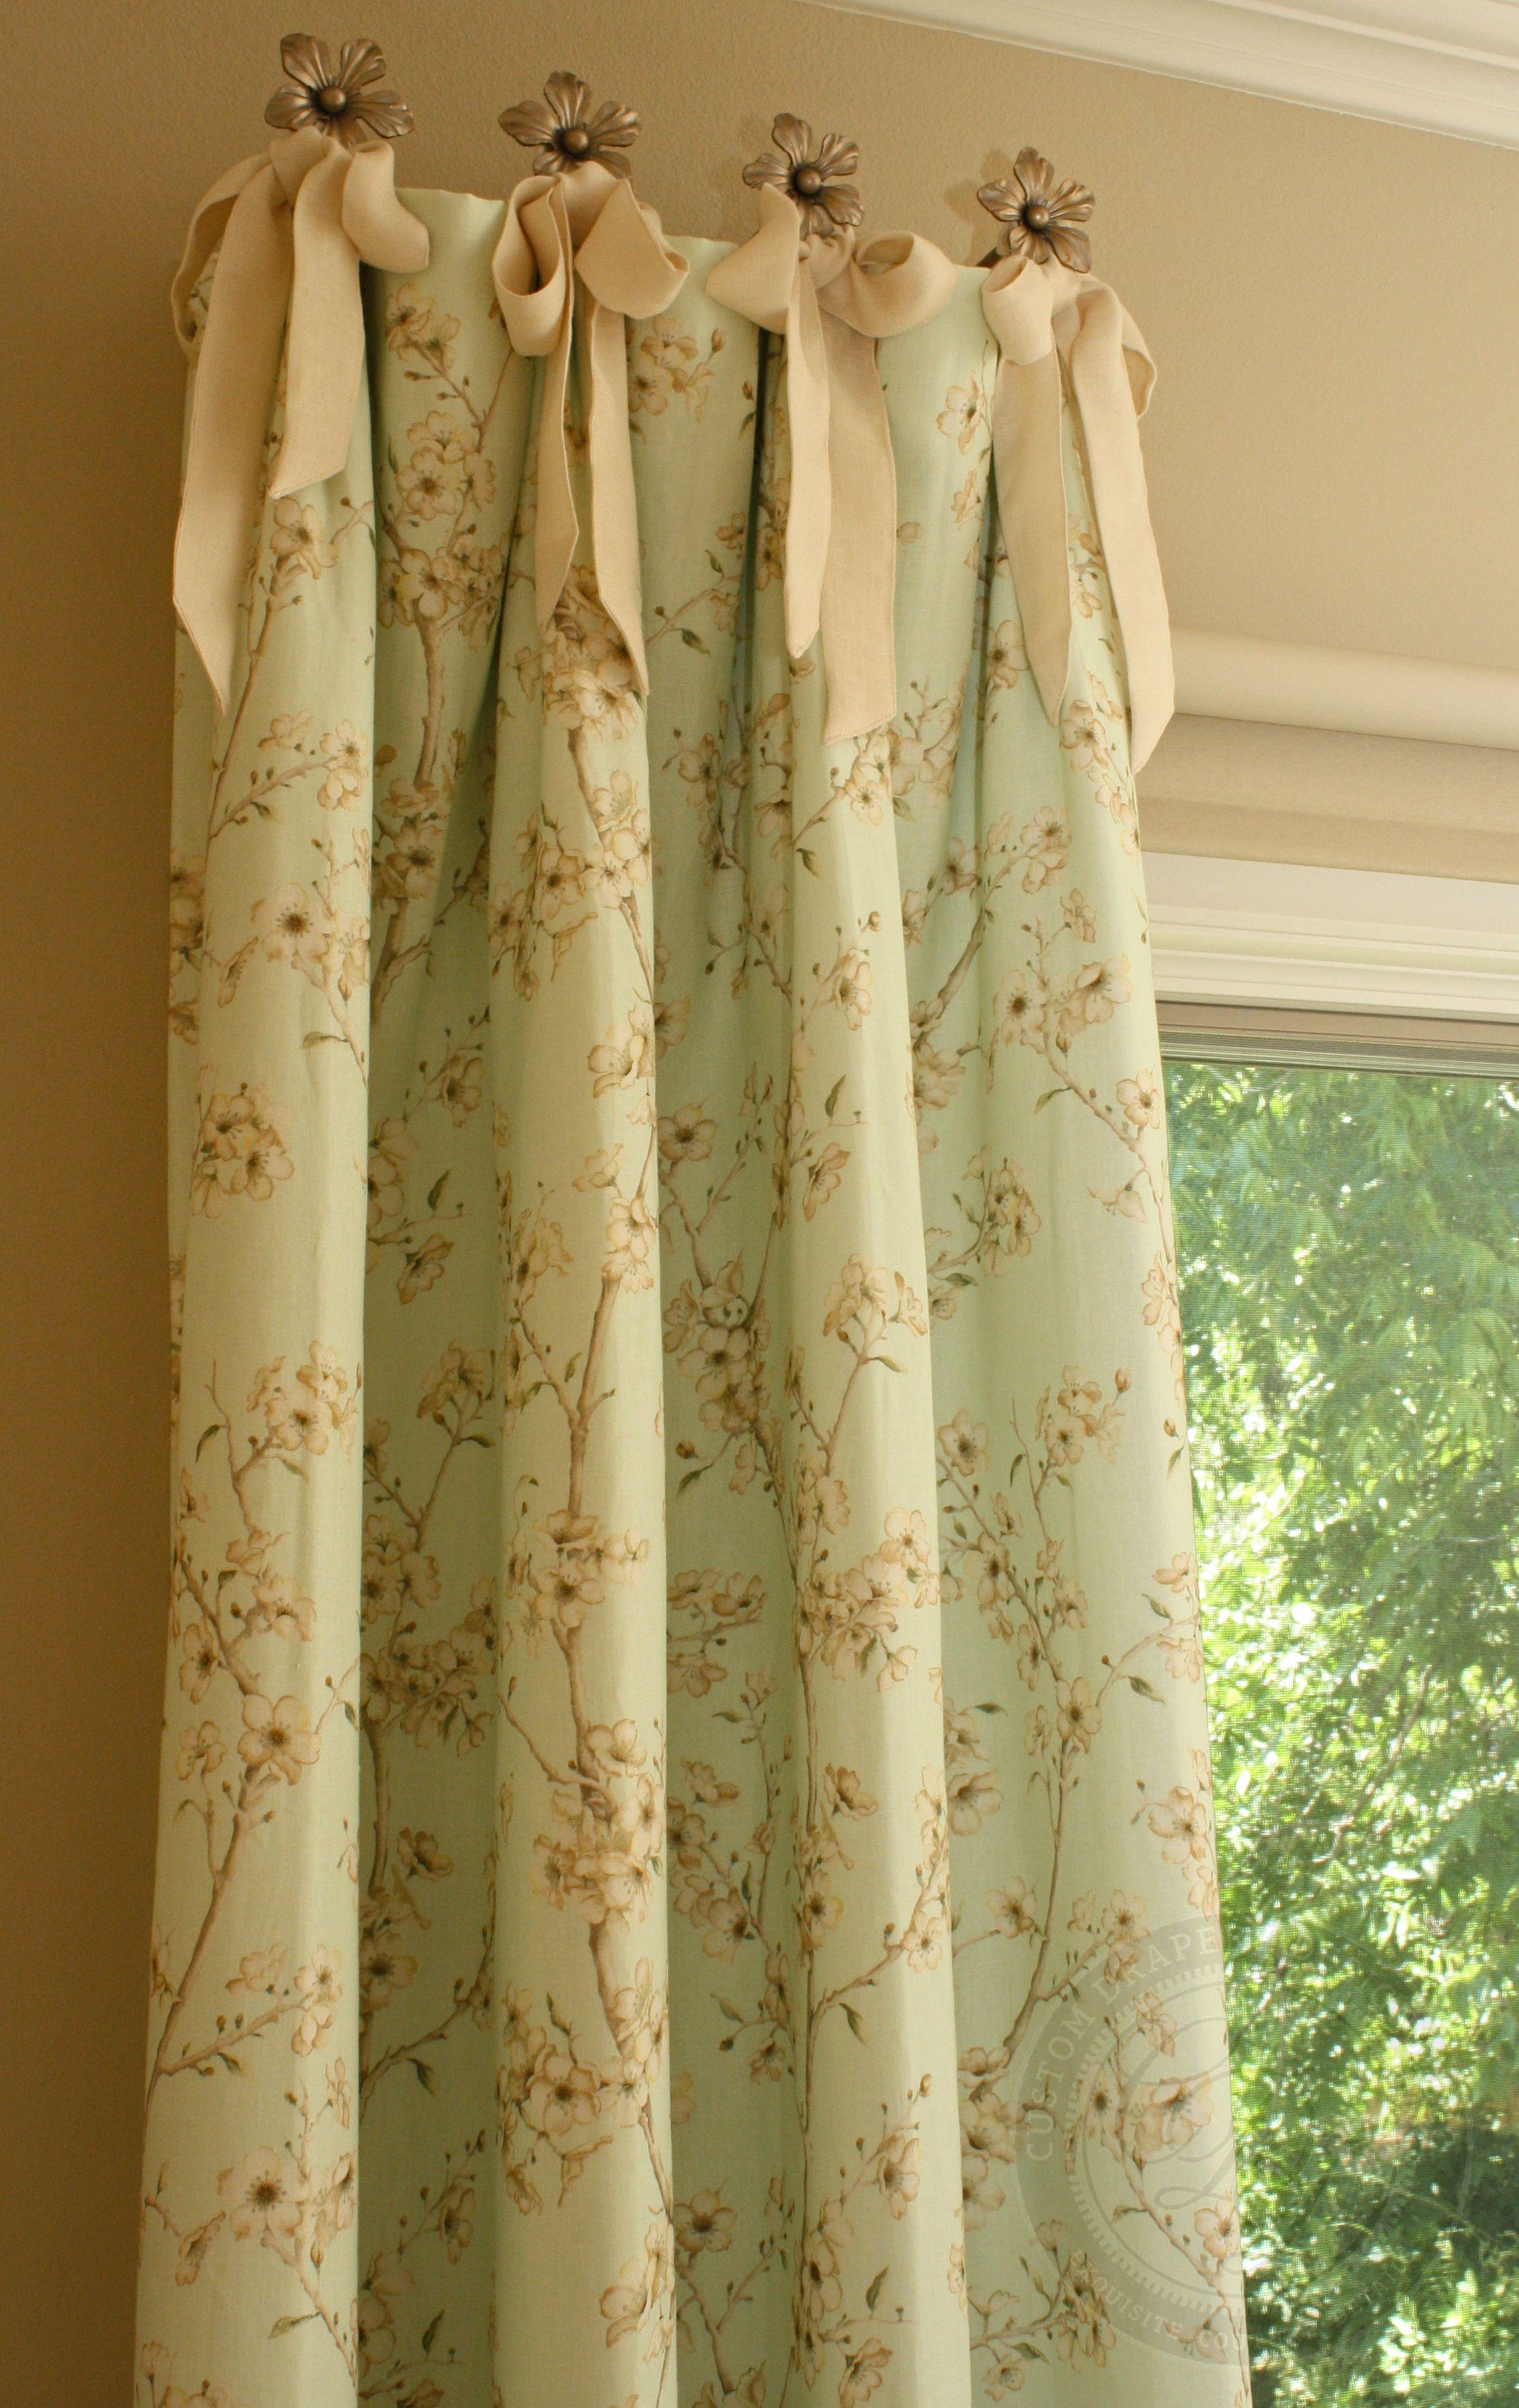 Inspiration Use D Ry Holdbacks To Hang Curtains